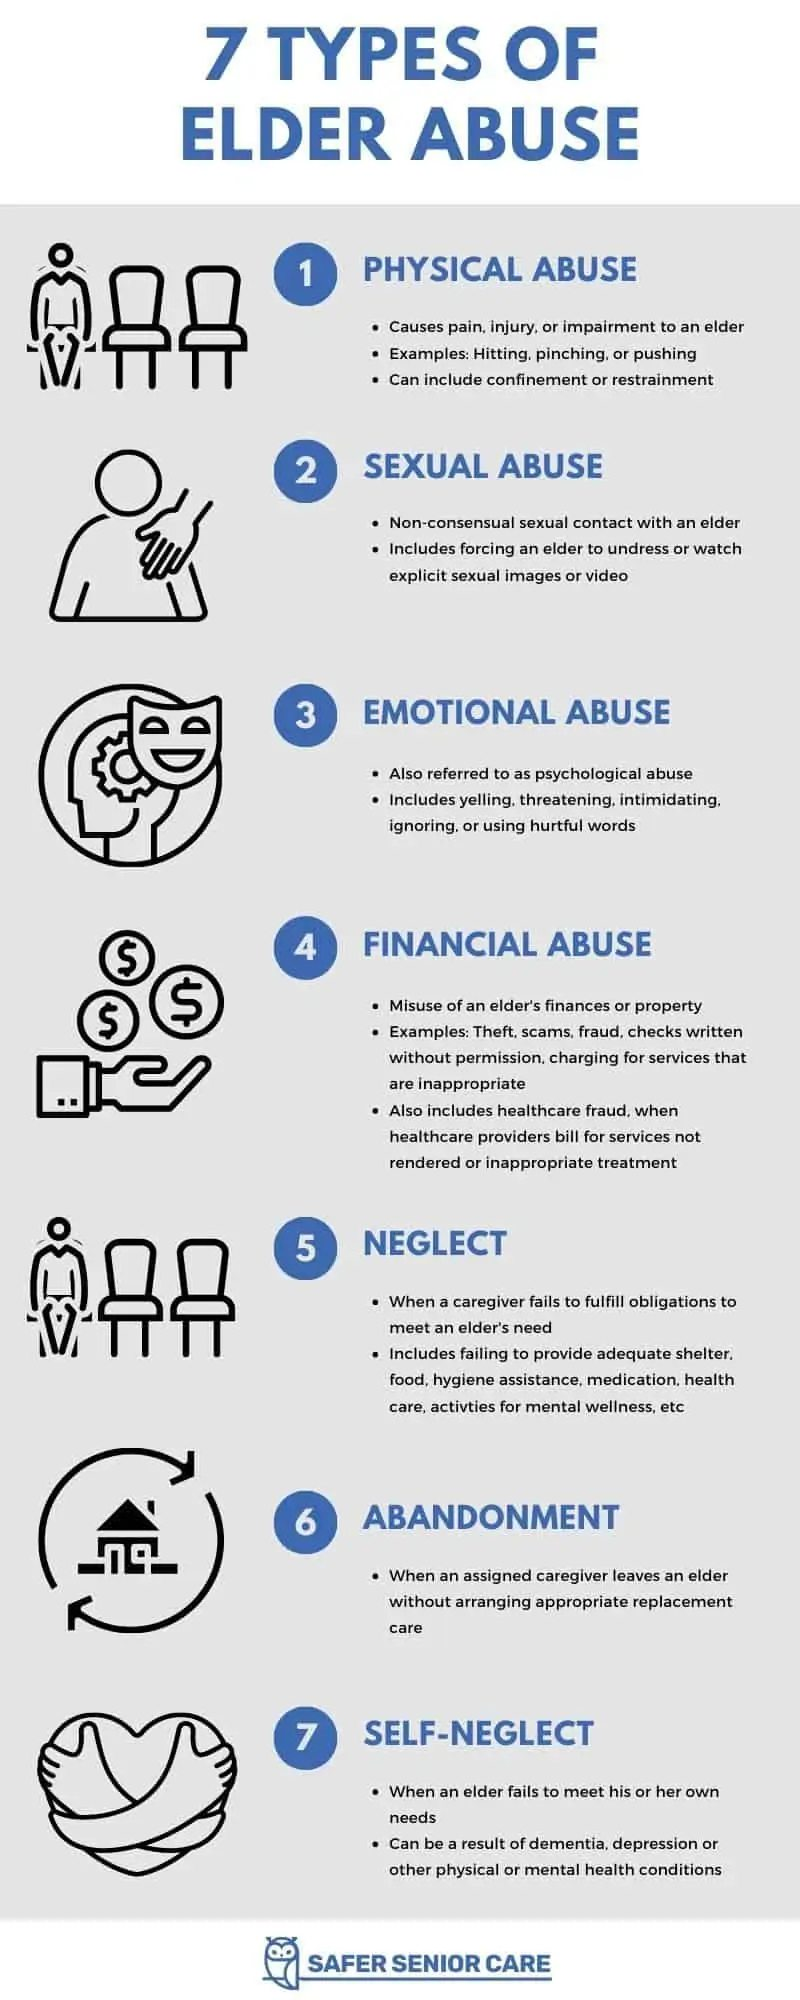 Seven types of Elder Abuse